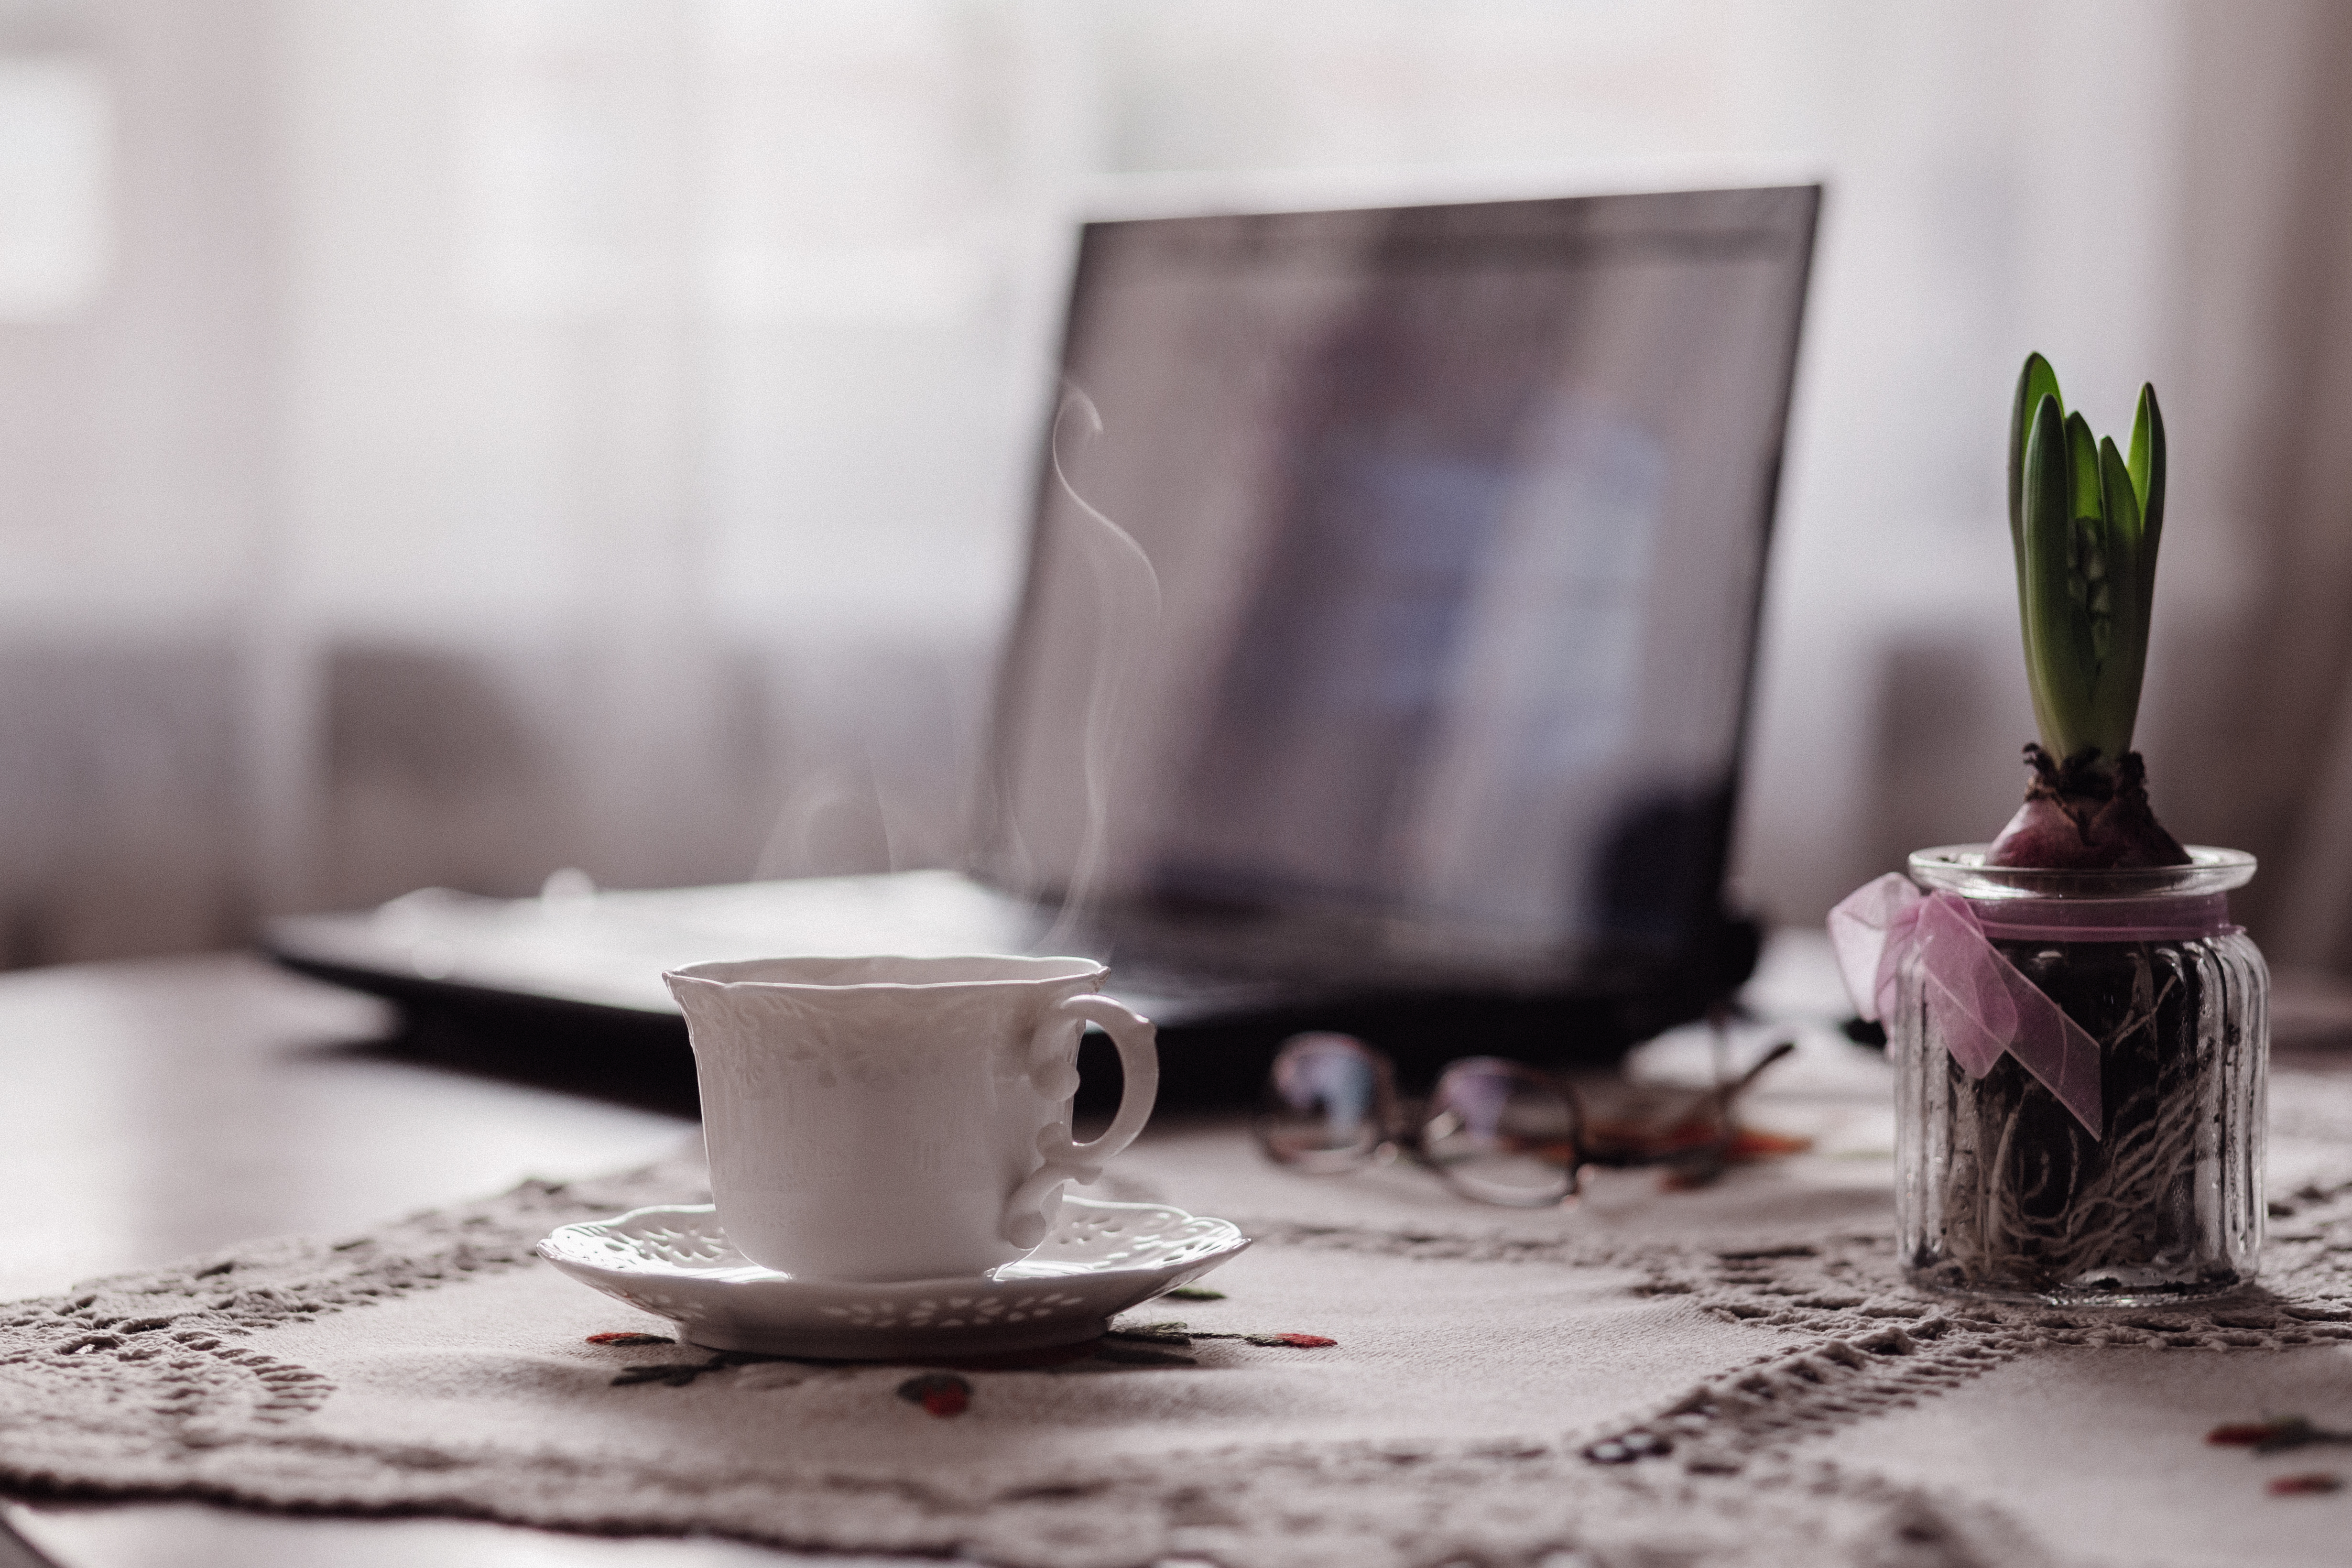 free stock photos of coffee table · pexels